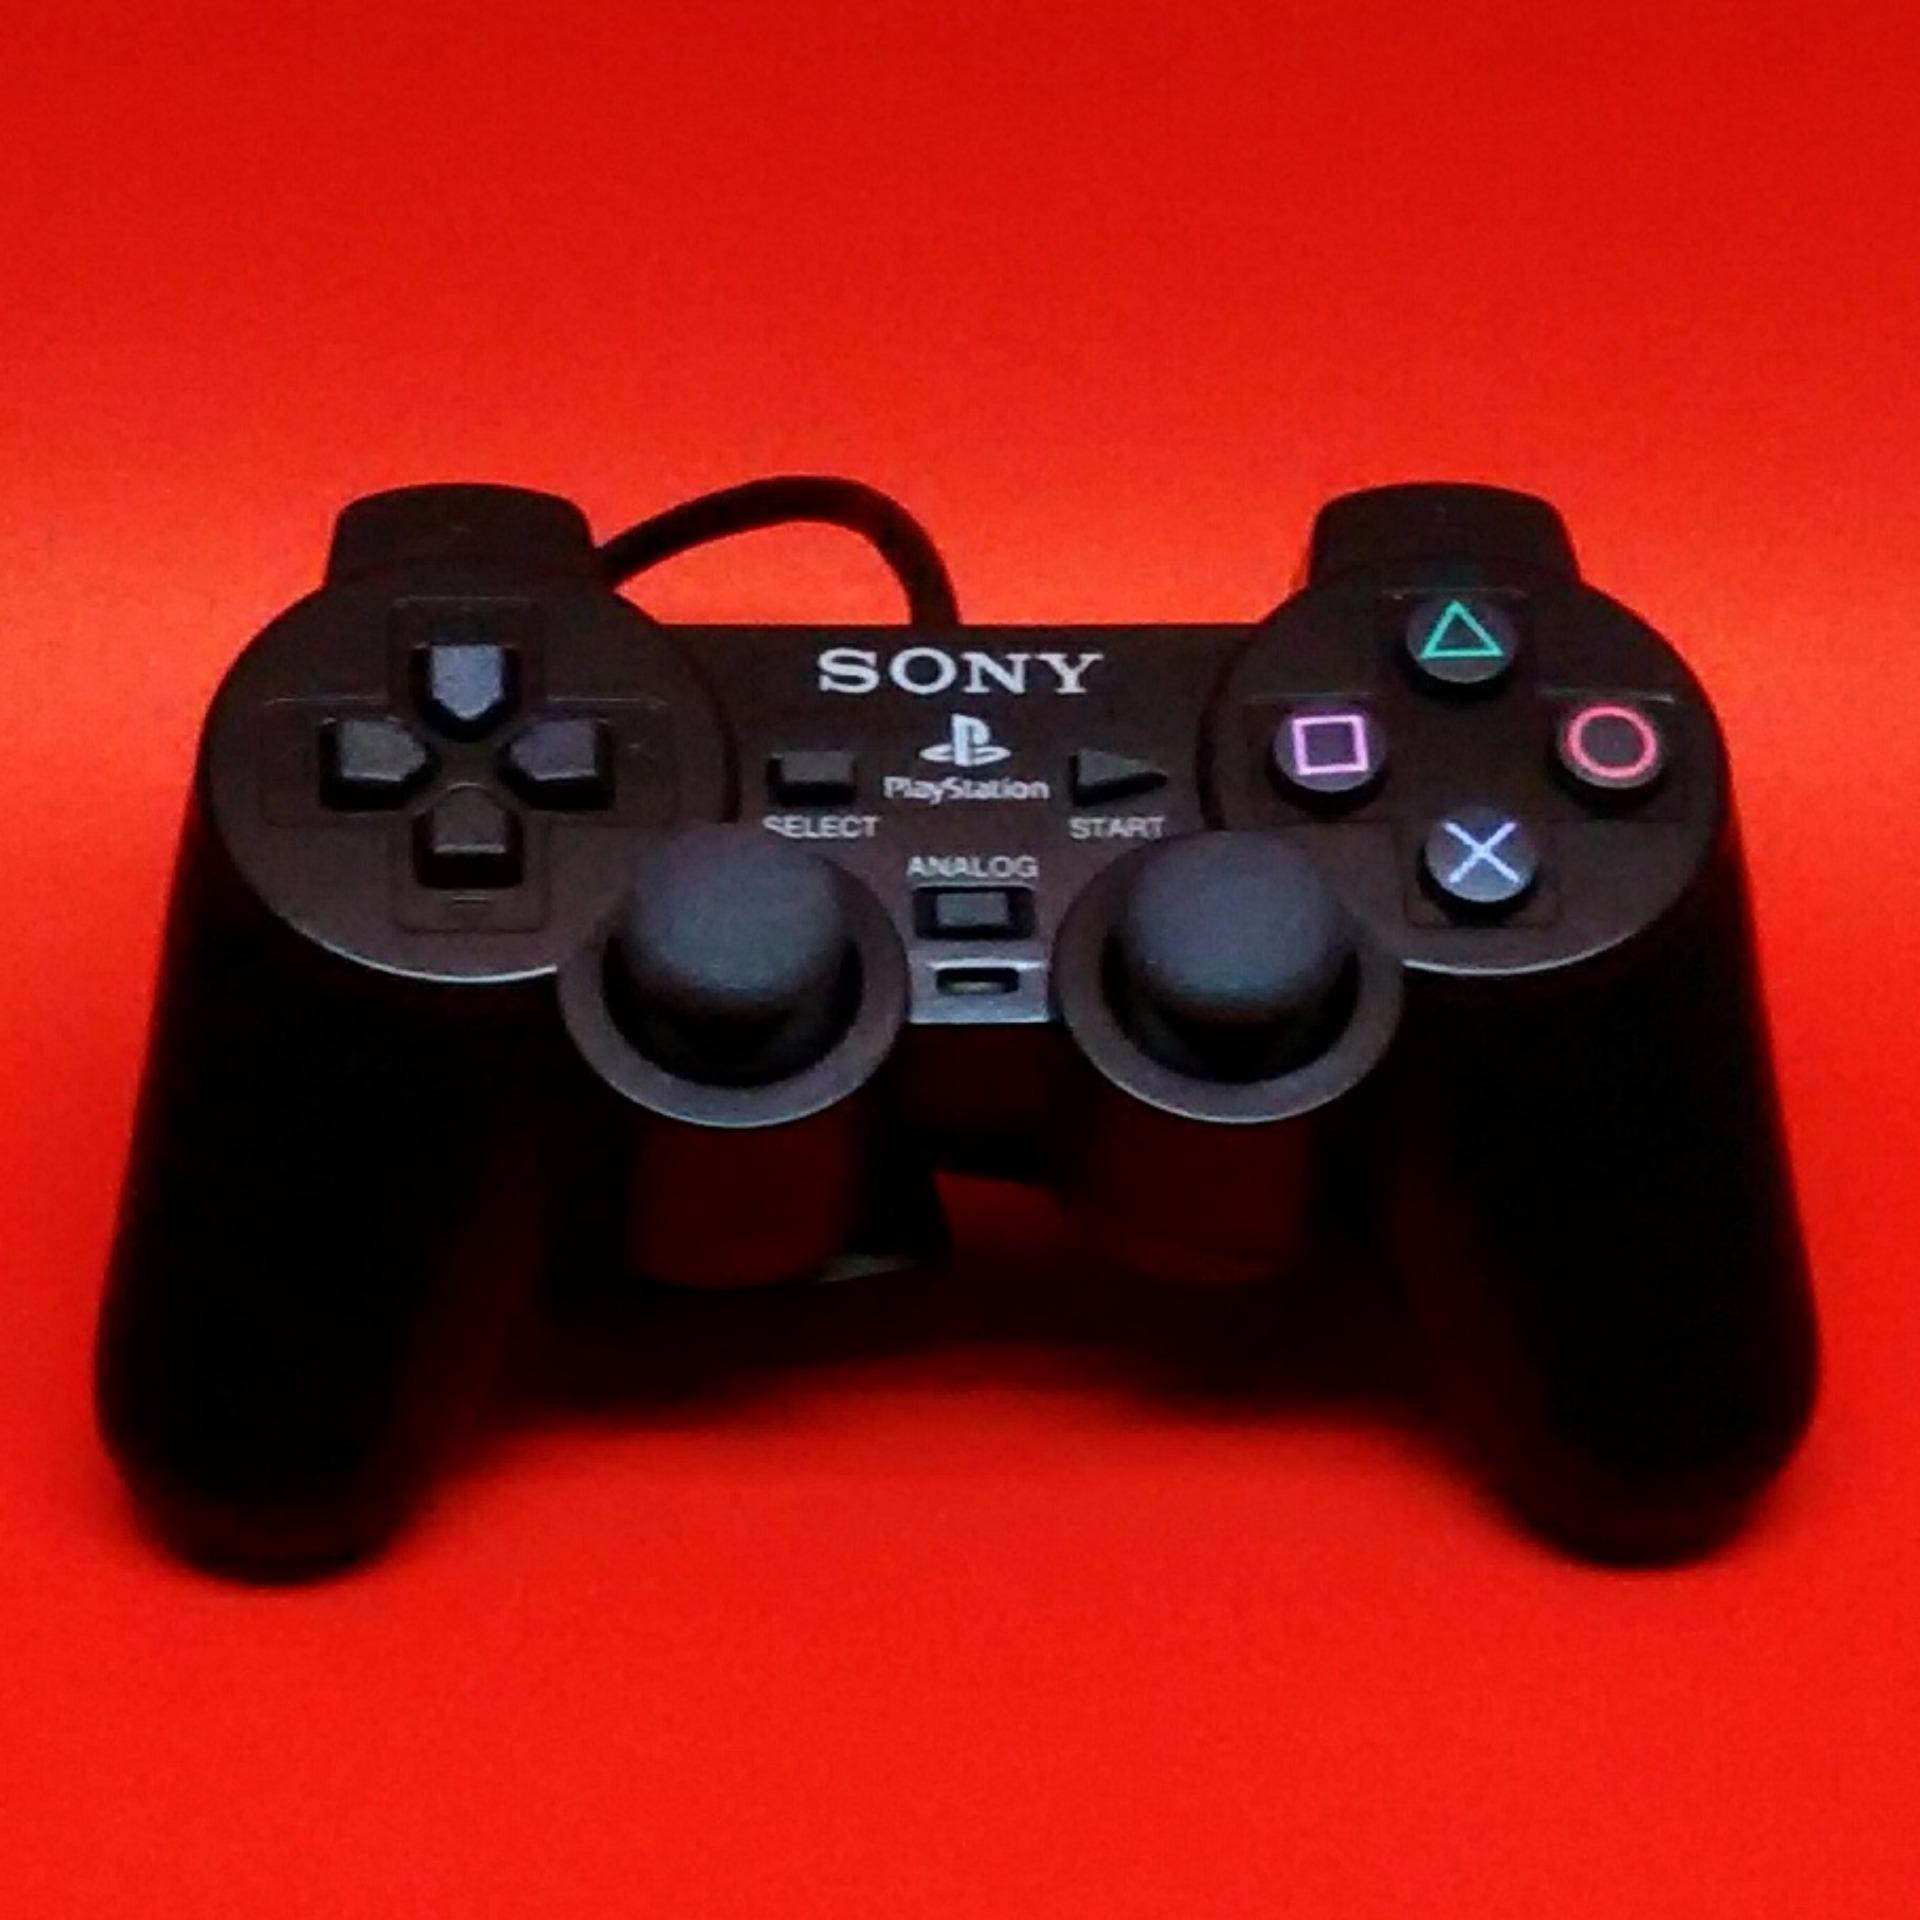 Refurbish Sony Playstation 2 Hardisk 40 Giga 50 Game Stik Getar Ps 3 Slim 20xxx Cfw 480 Hdd Internal 120gb Shock Price Stick Ps2 Black Penjualan Hanya Rp41985